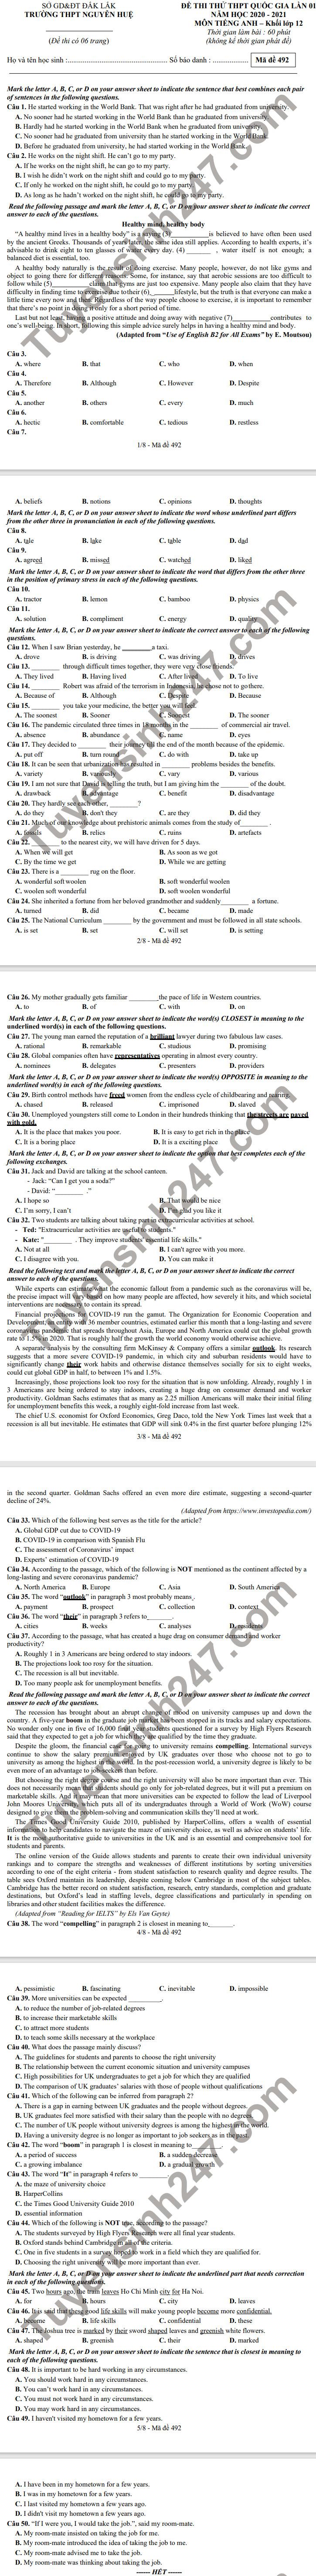 De thi thu tot nghiep THPT 2021 lan 1 mon Anh - THPT Nguyen Hue (Co dap an)